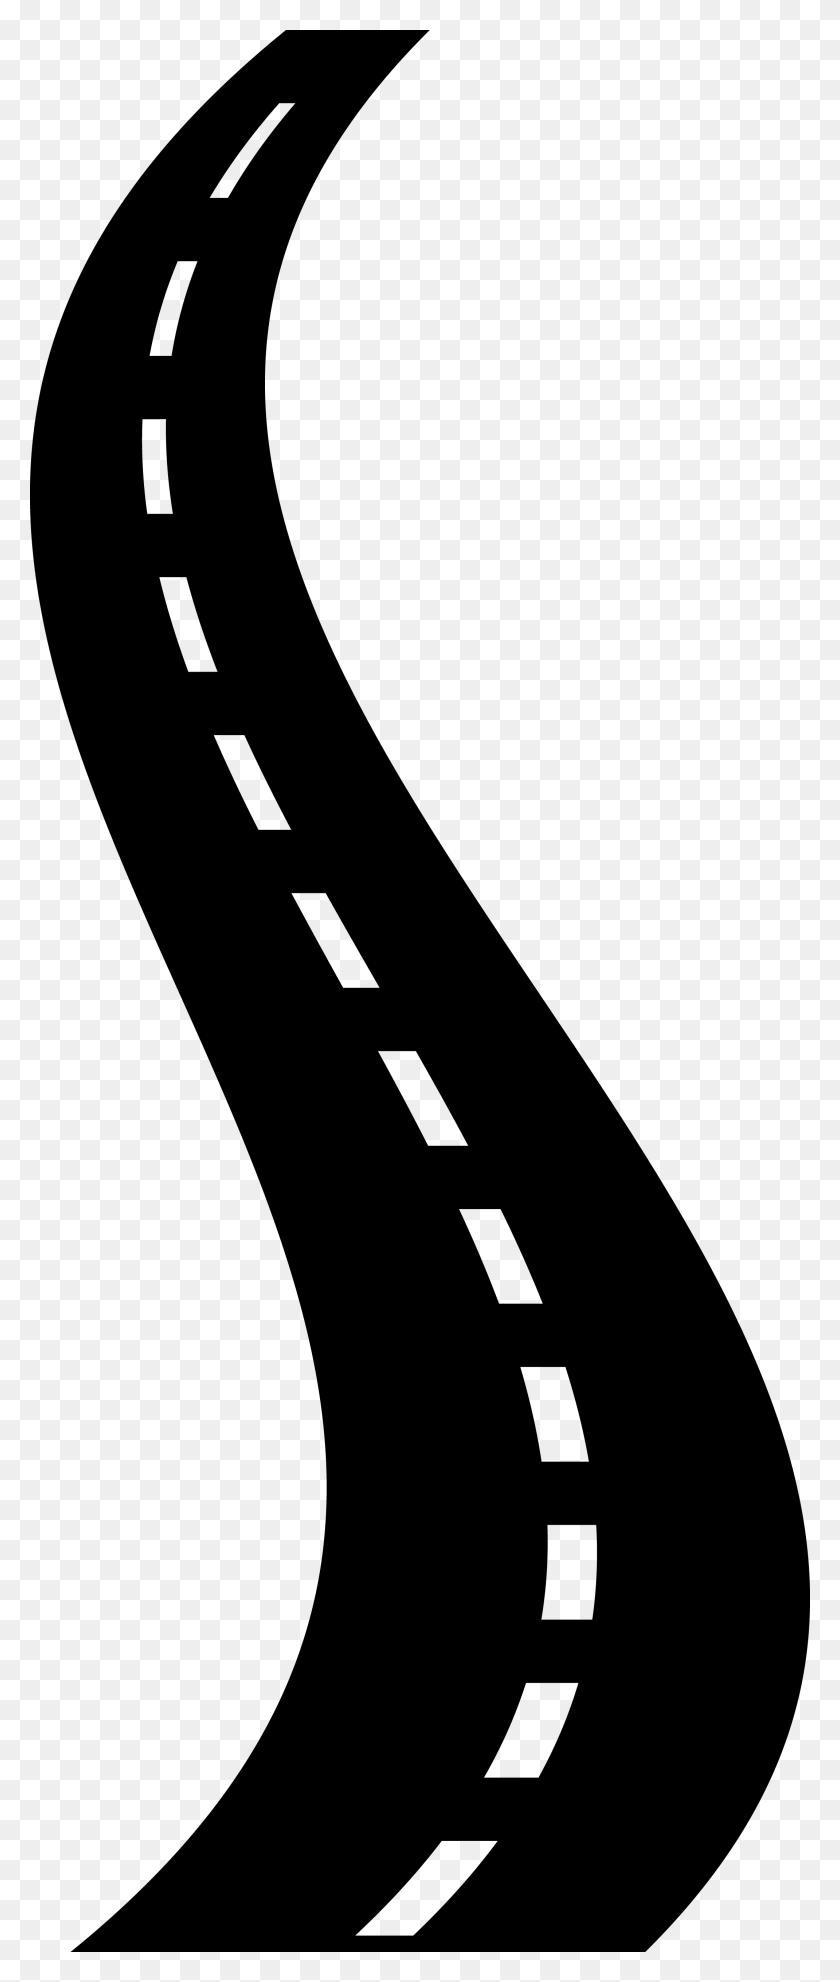 Road Png Download Free - Road PNG